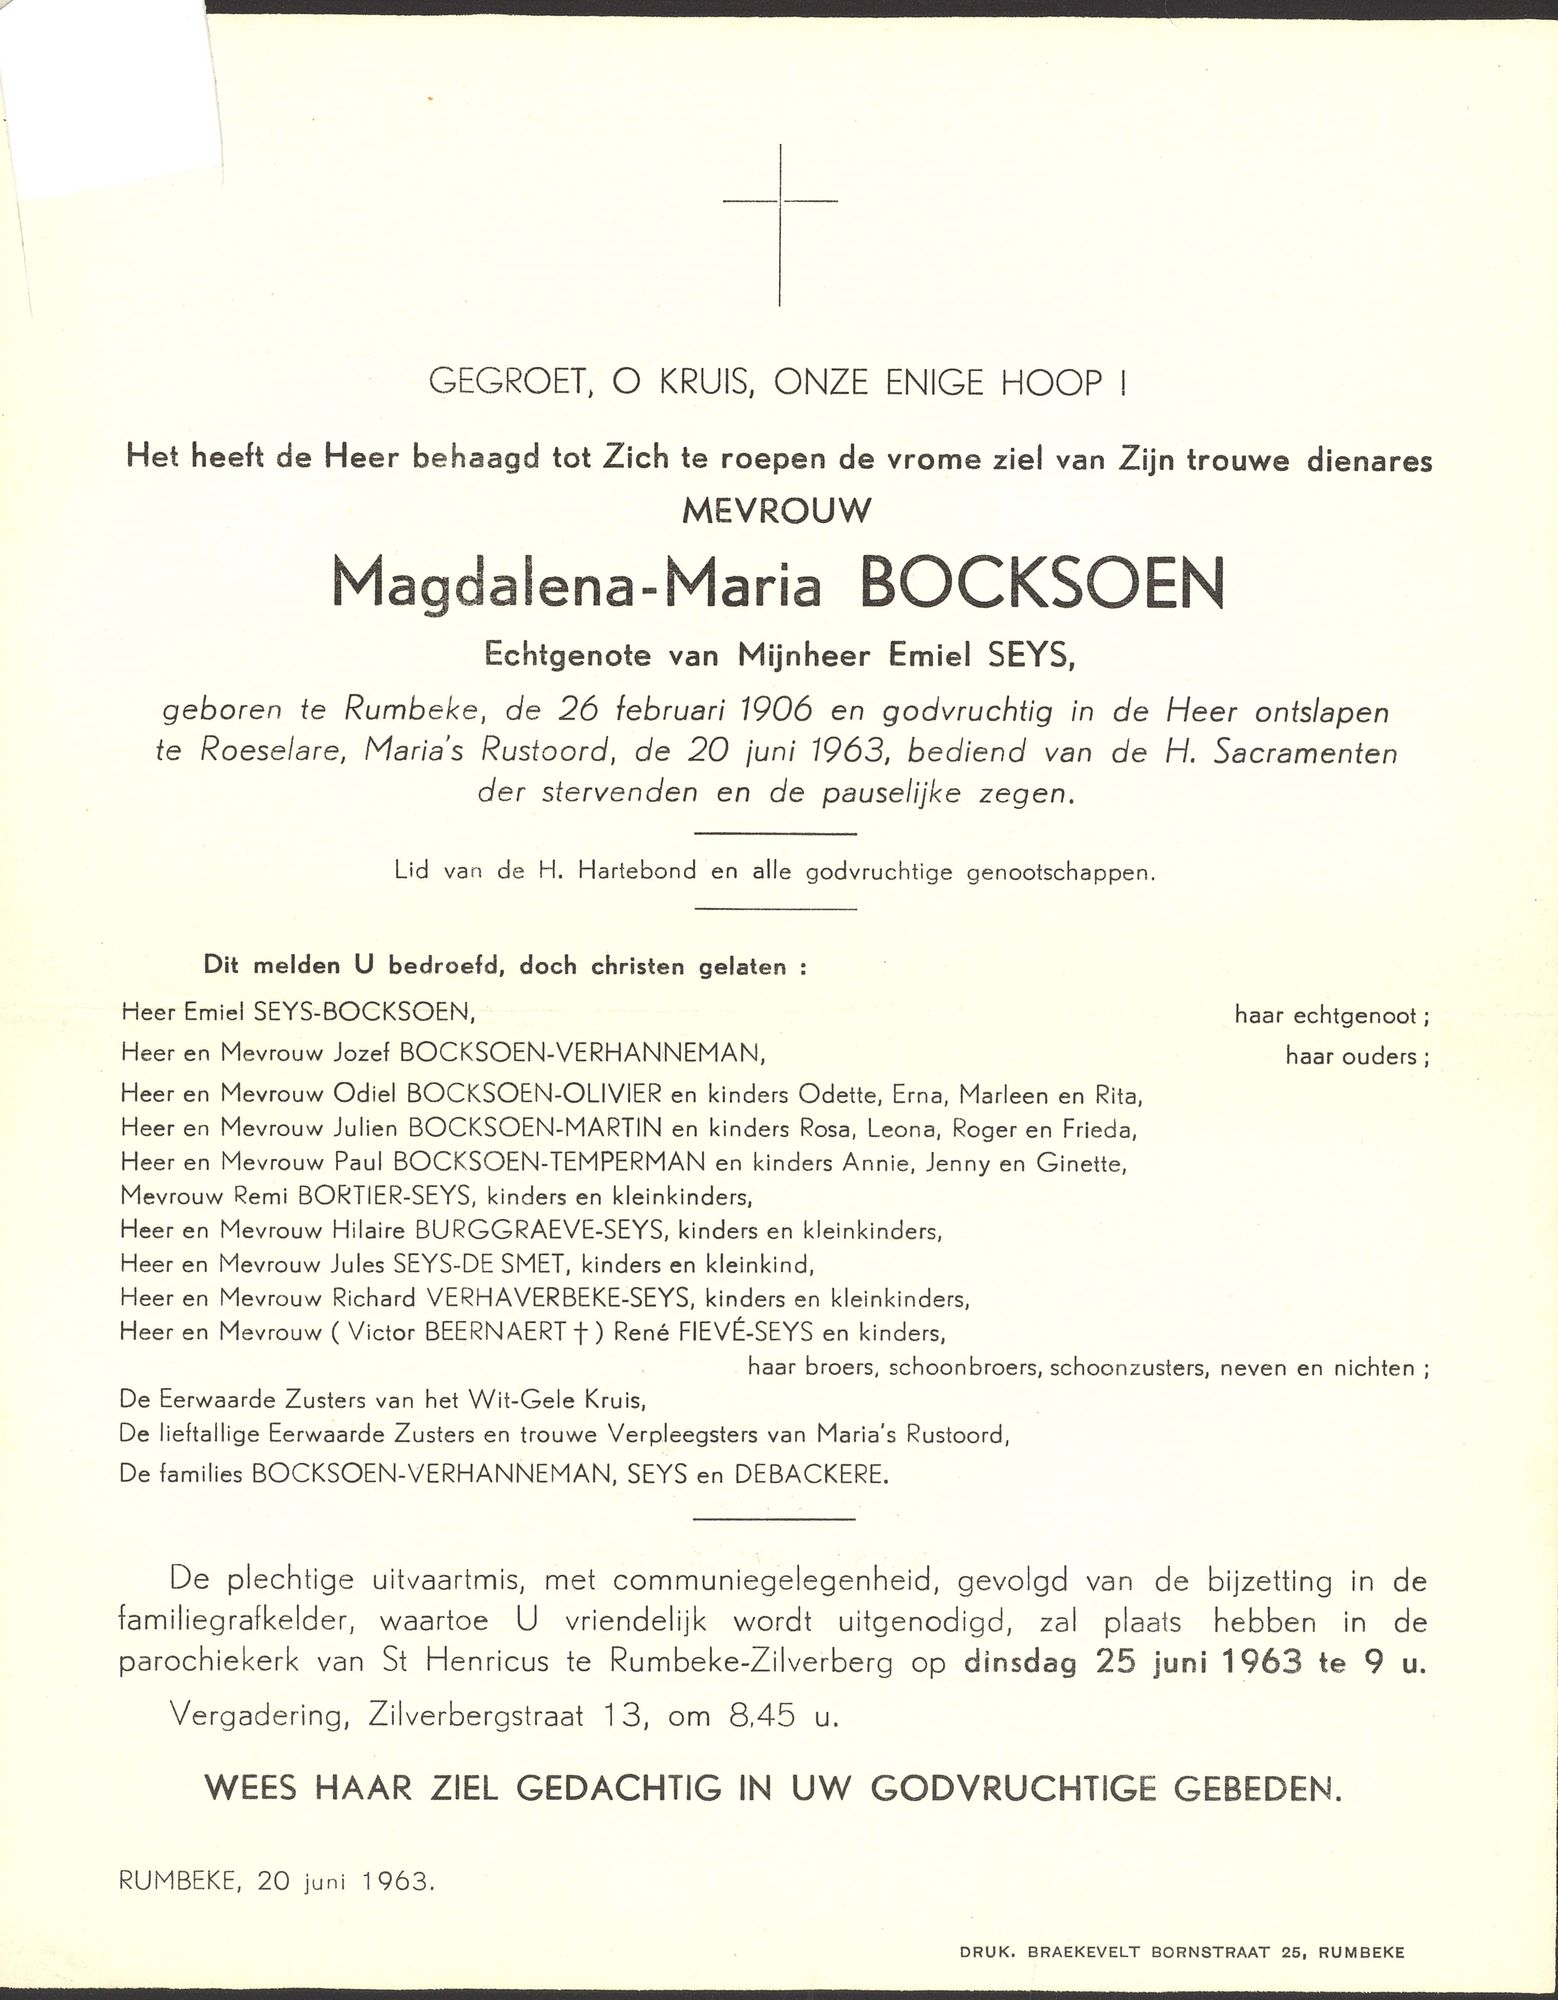 Magdalena-Maria Bocksoen